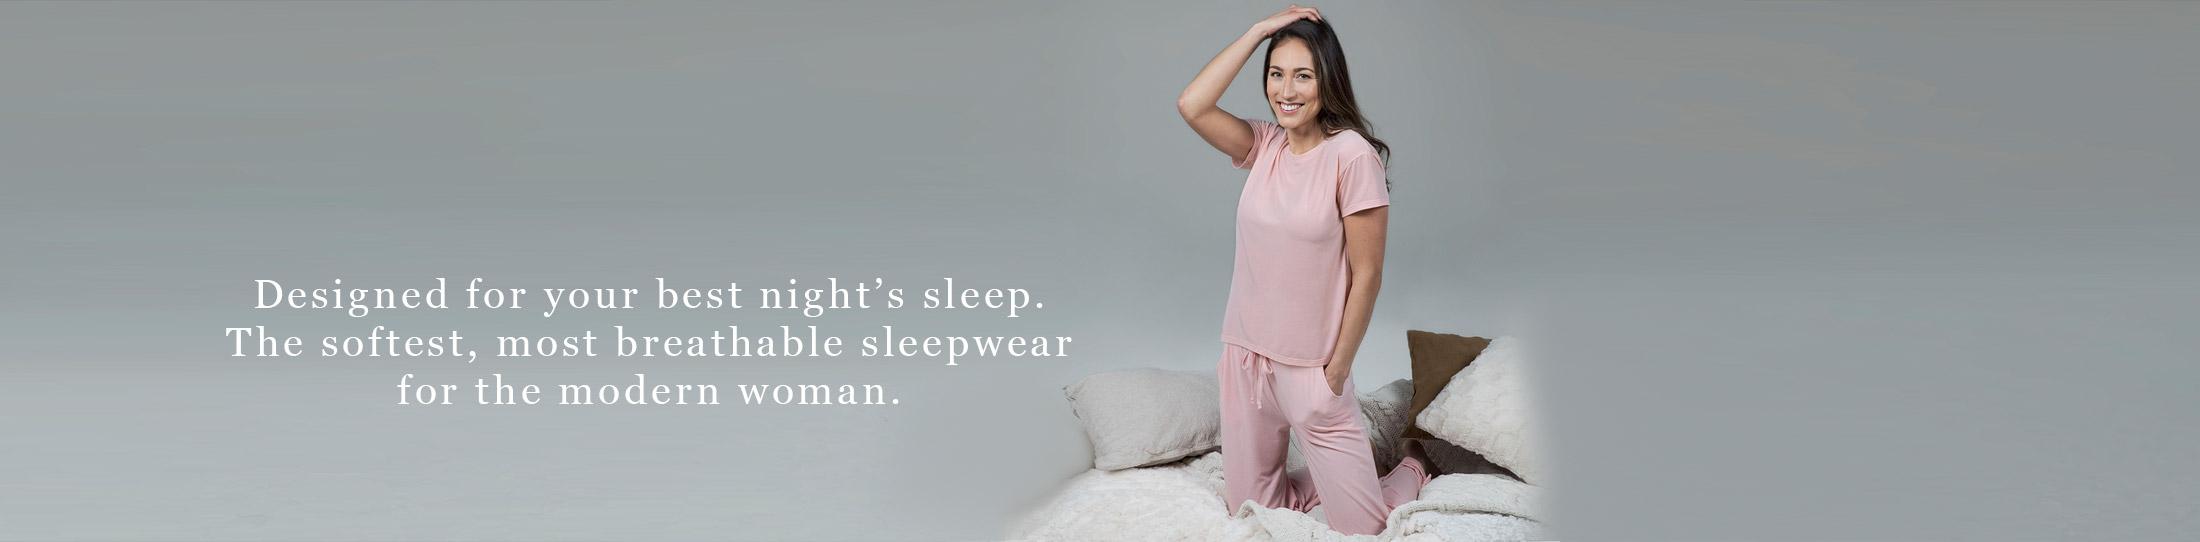 product-category-banner-luxurious-sleepwear-2.jpg